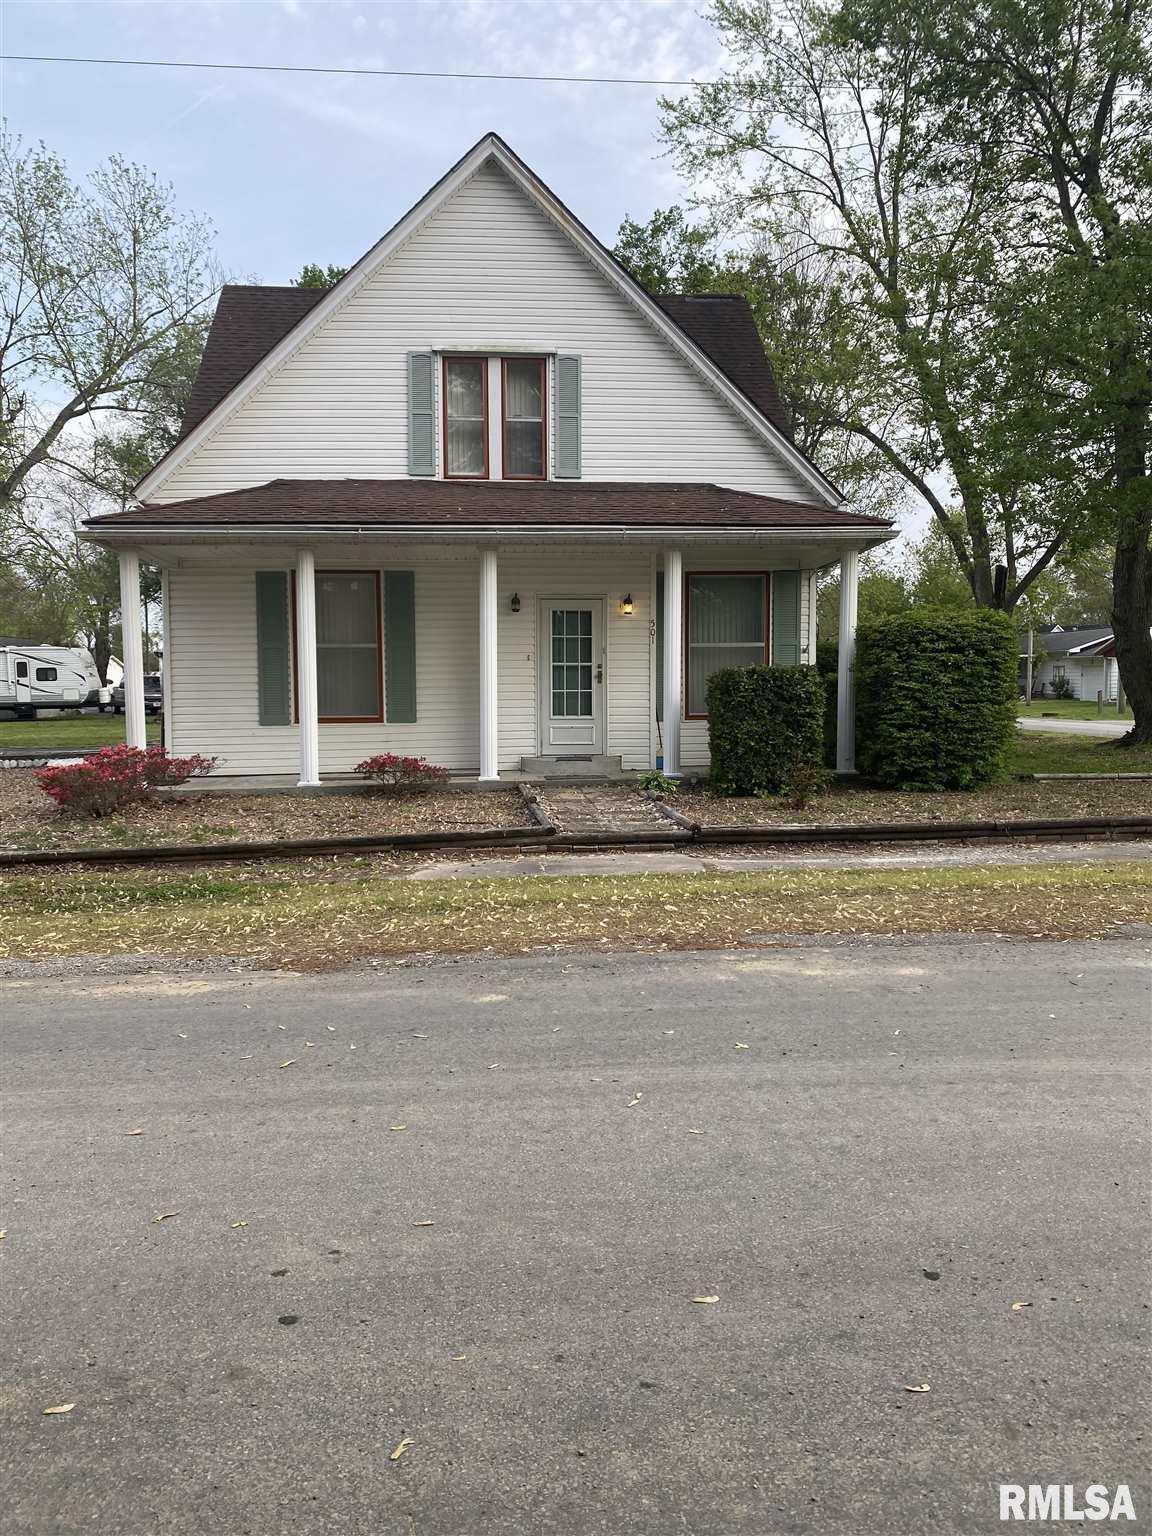 501 CHURCH Property Photo - Galatia, IL real estate listing